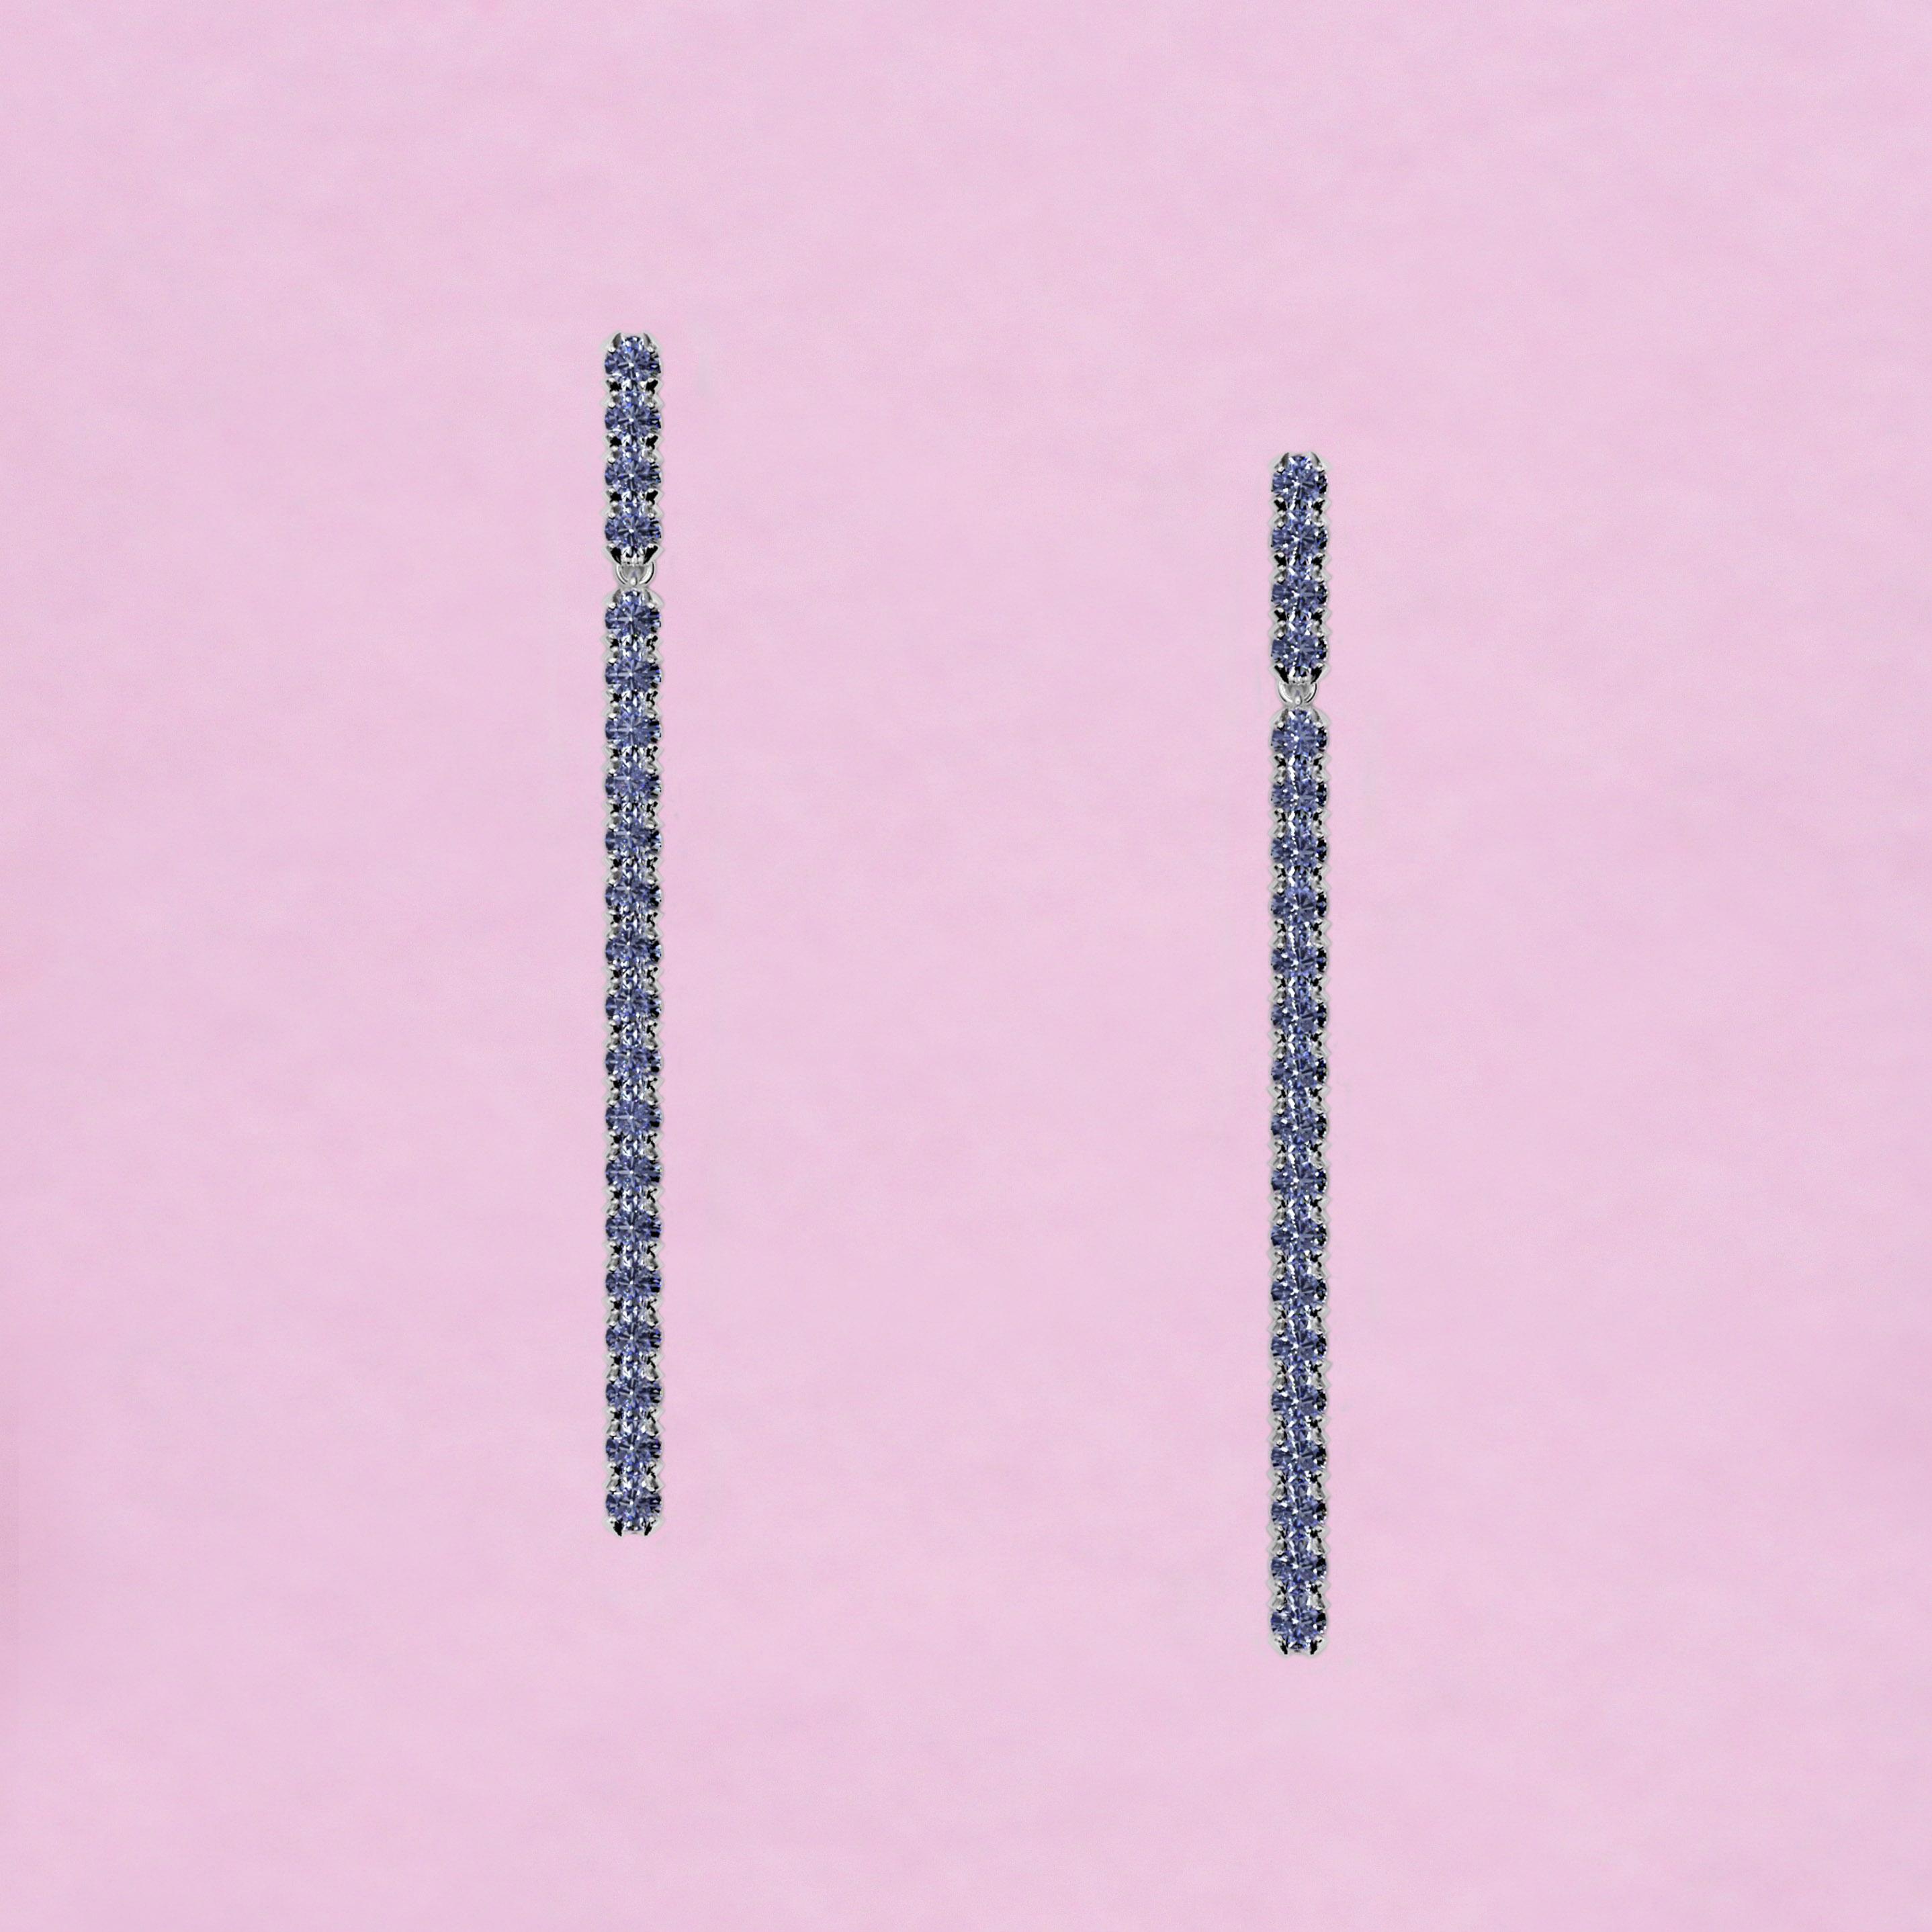 blossom long earrings – sky blue sapphire and 18k white gold